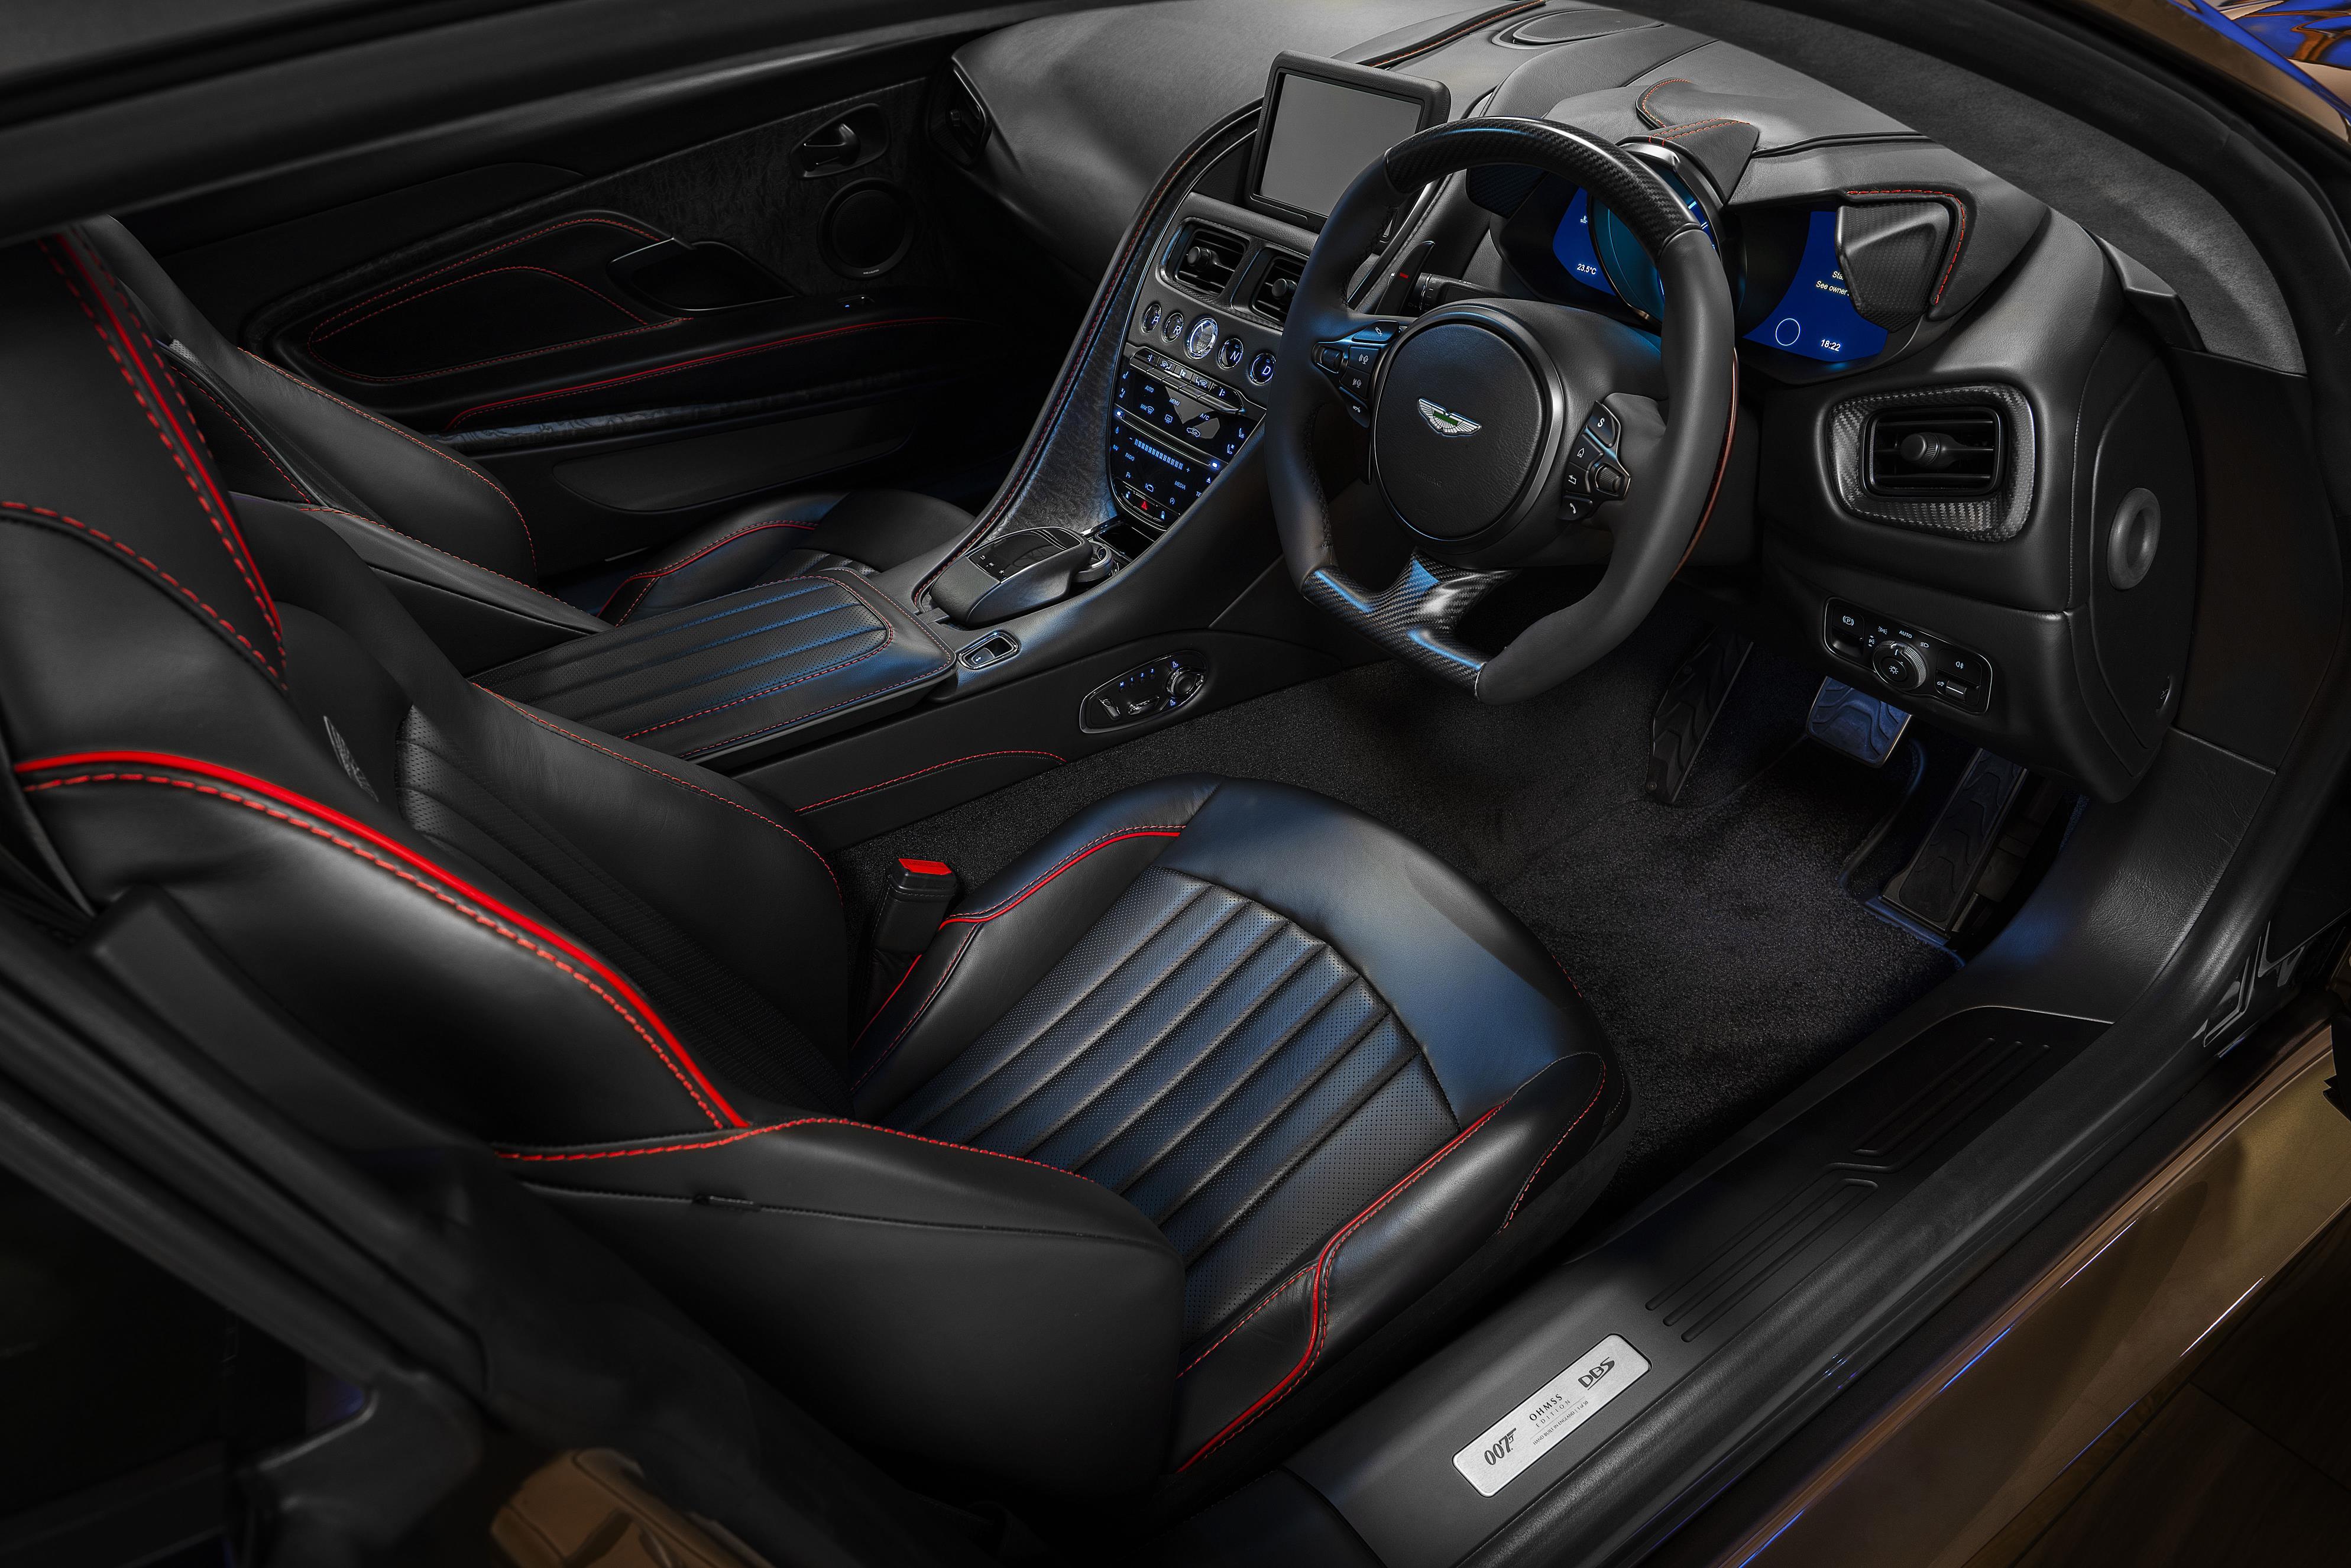 Aston Martin DBS Superleggera Cockpit